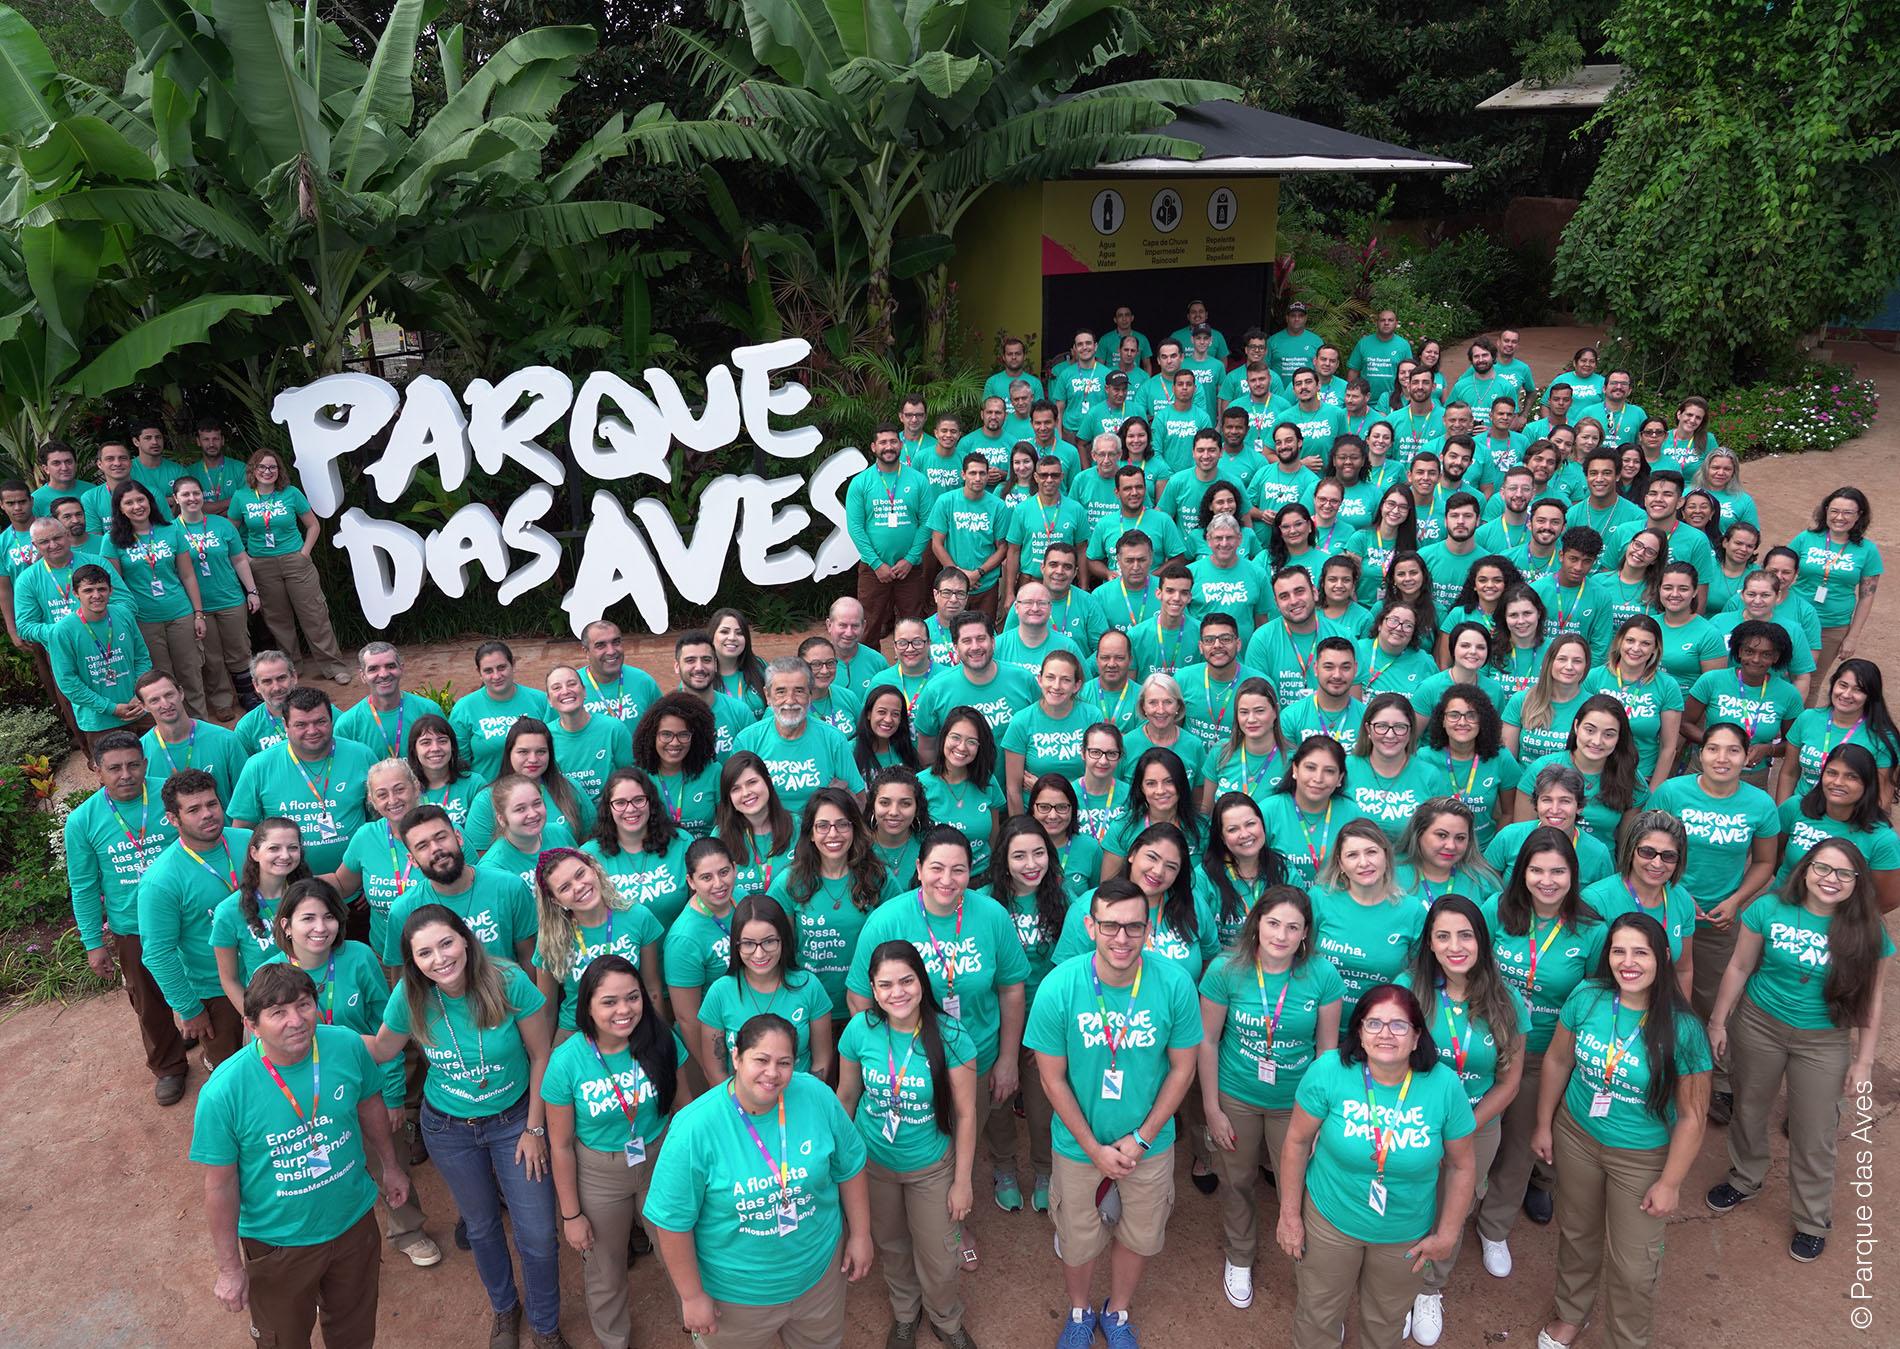 ParquedasAves